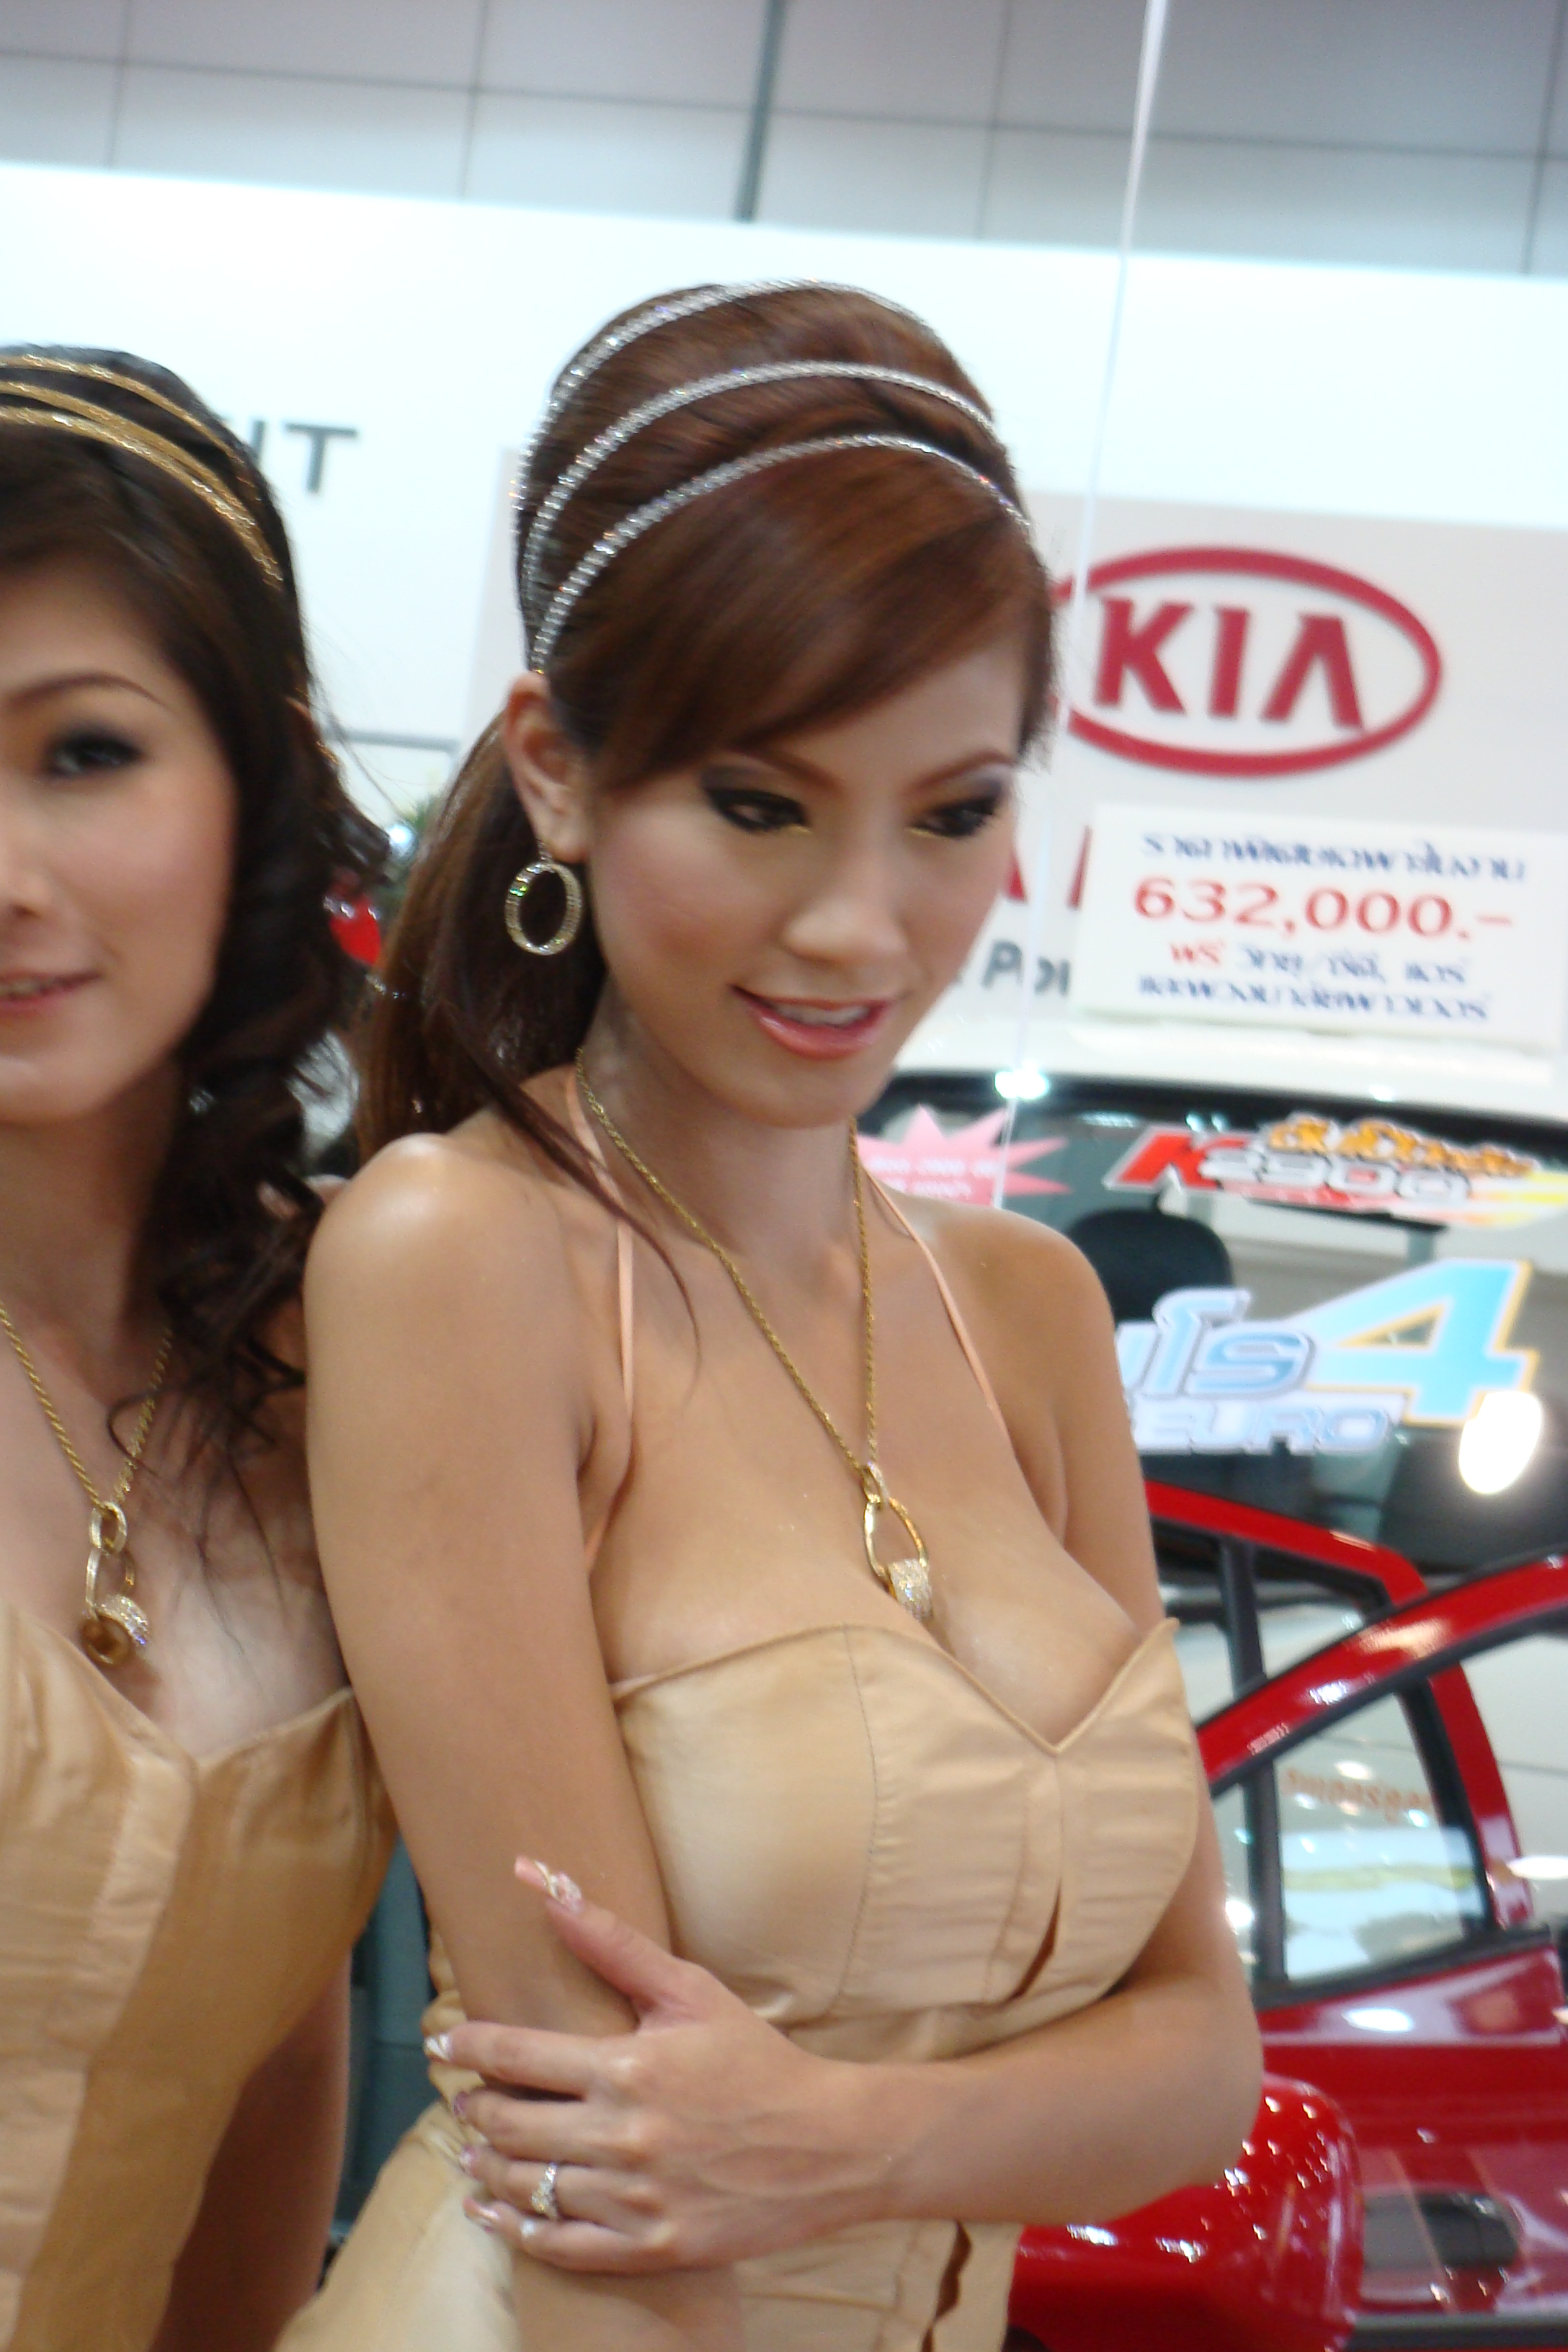 Thai beauty treats a guy nicely